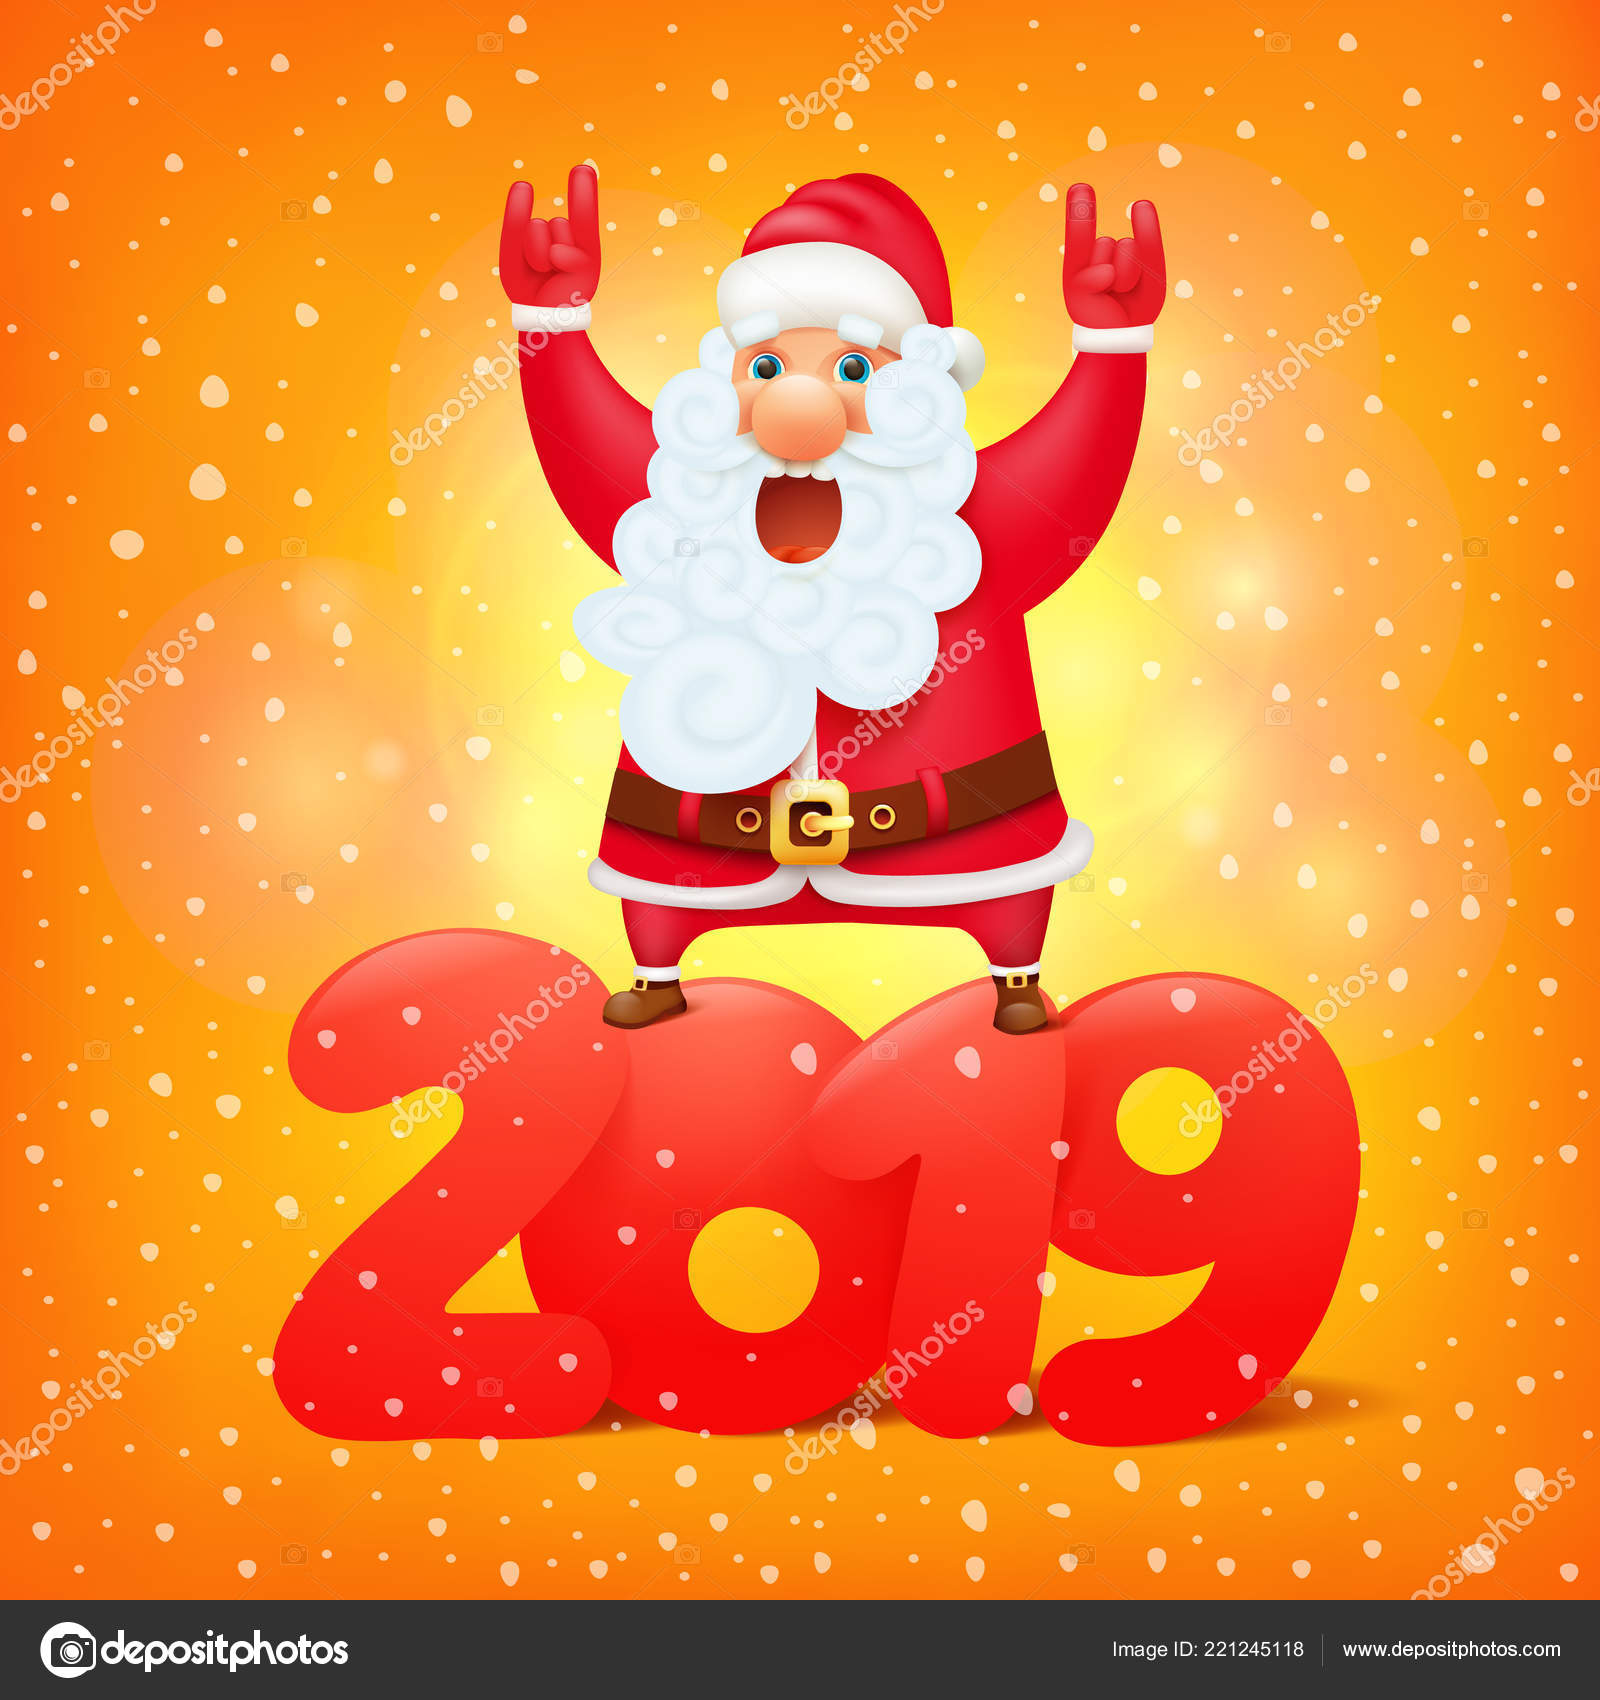 santa claus symbol 2019 cartoon character greeting card template